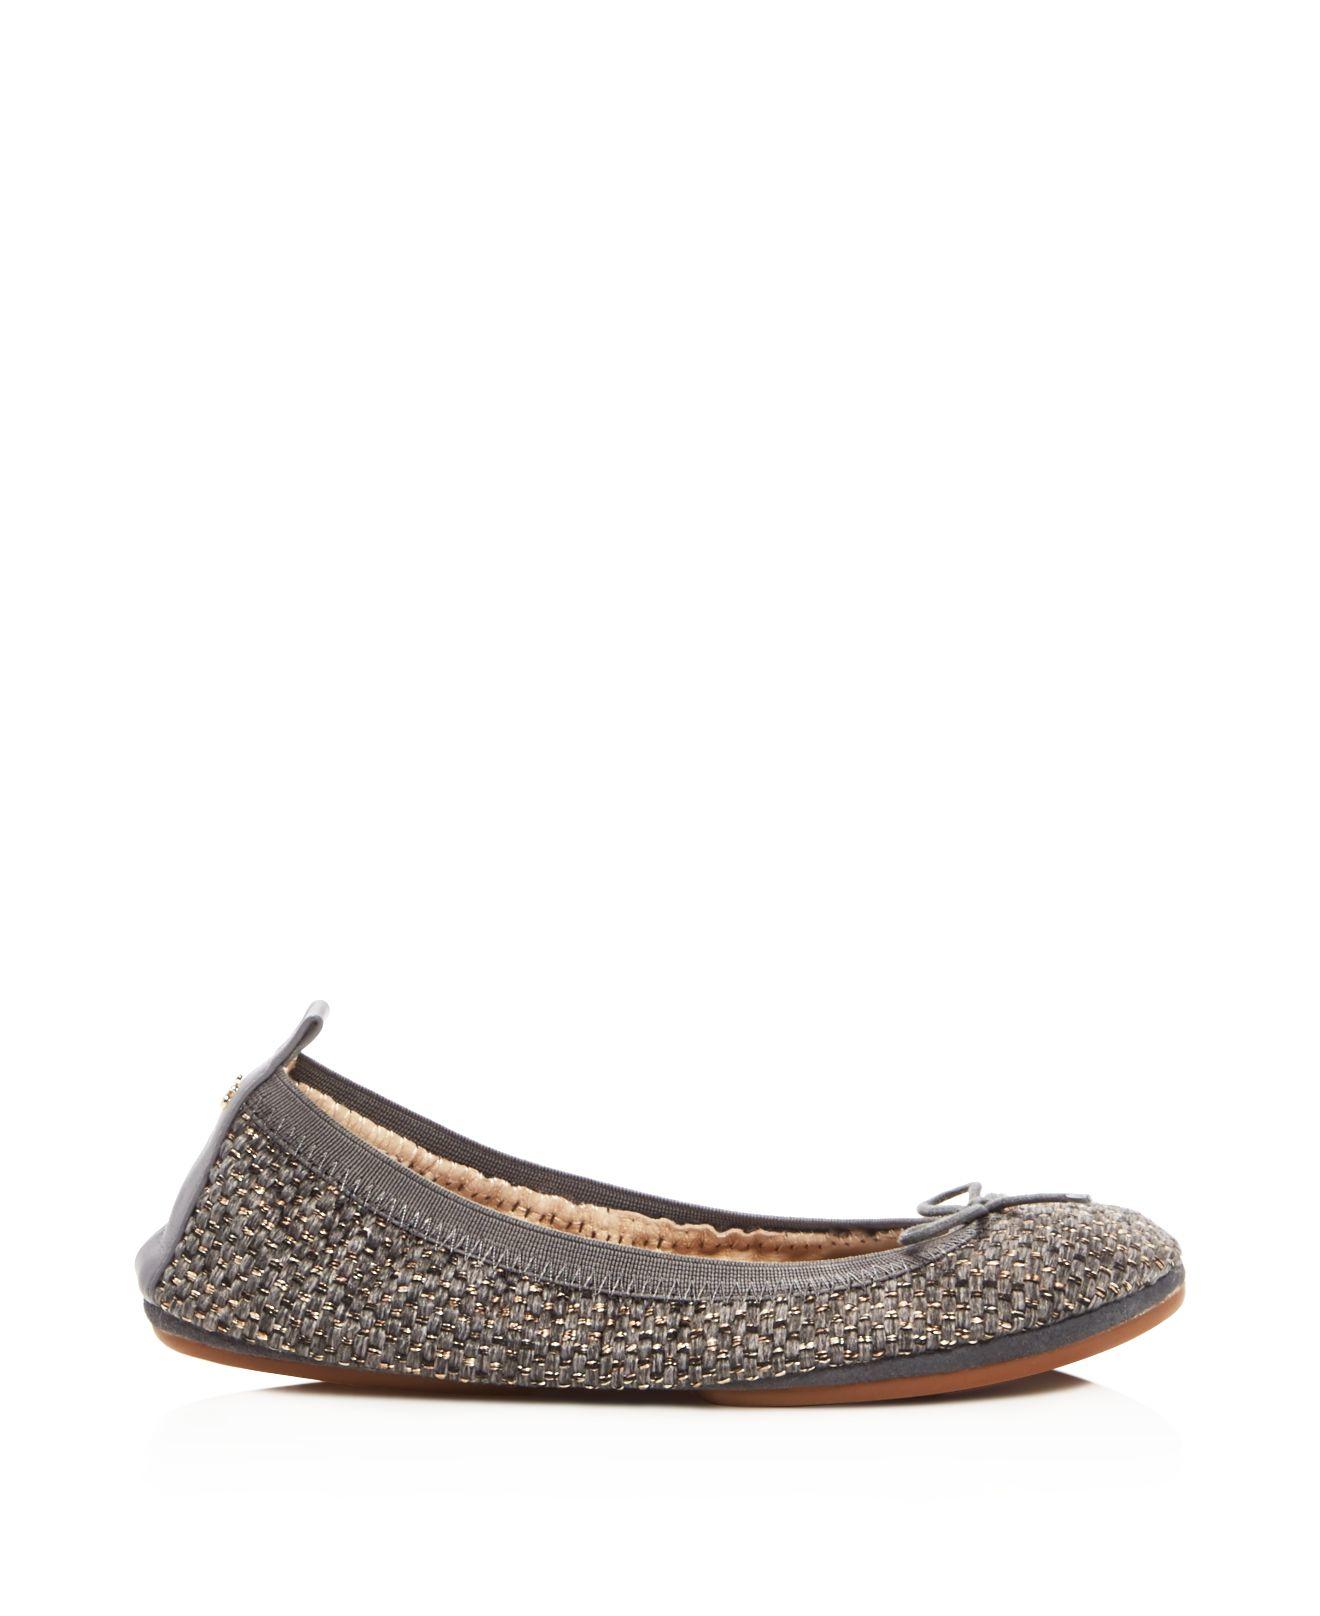 9709f8a04679 Lyst - Yosi Samra Sandrine Melange Tweed Ballet Flats in Brown